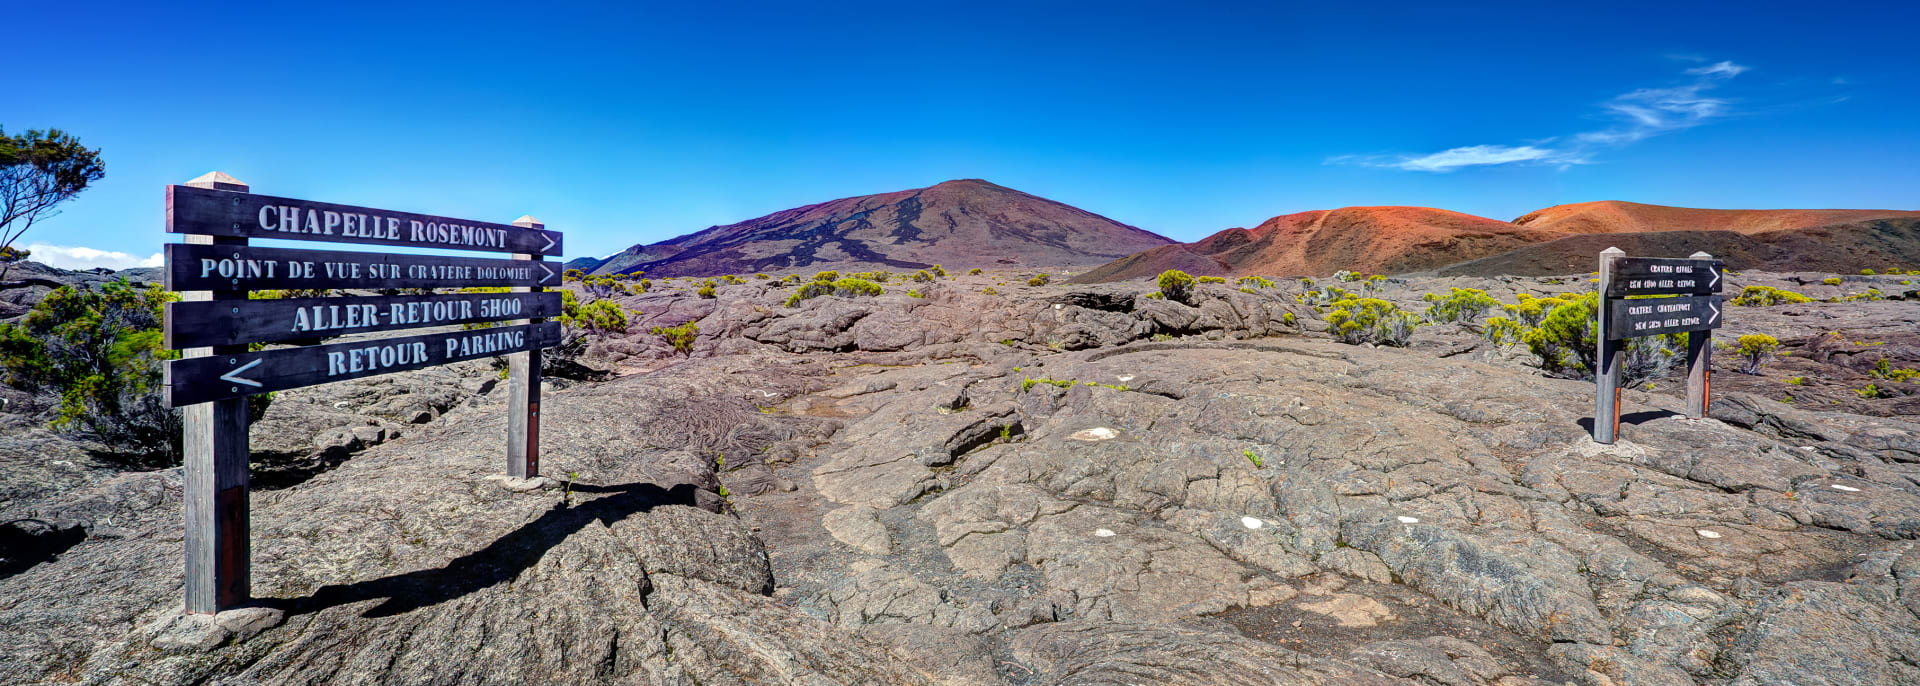 Piton de la Fournaise, La Reunion